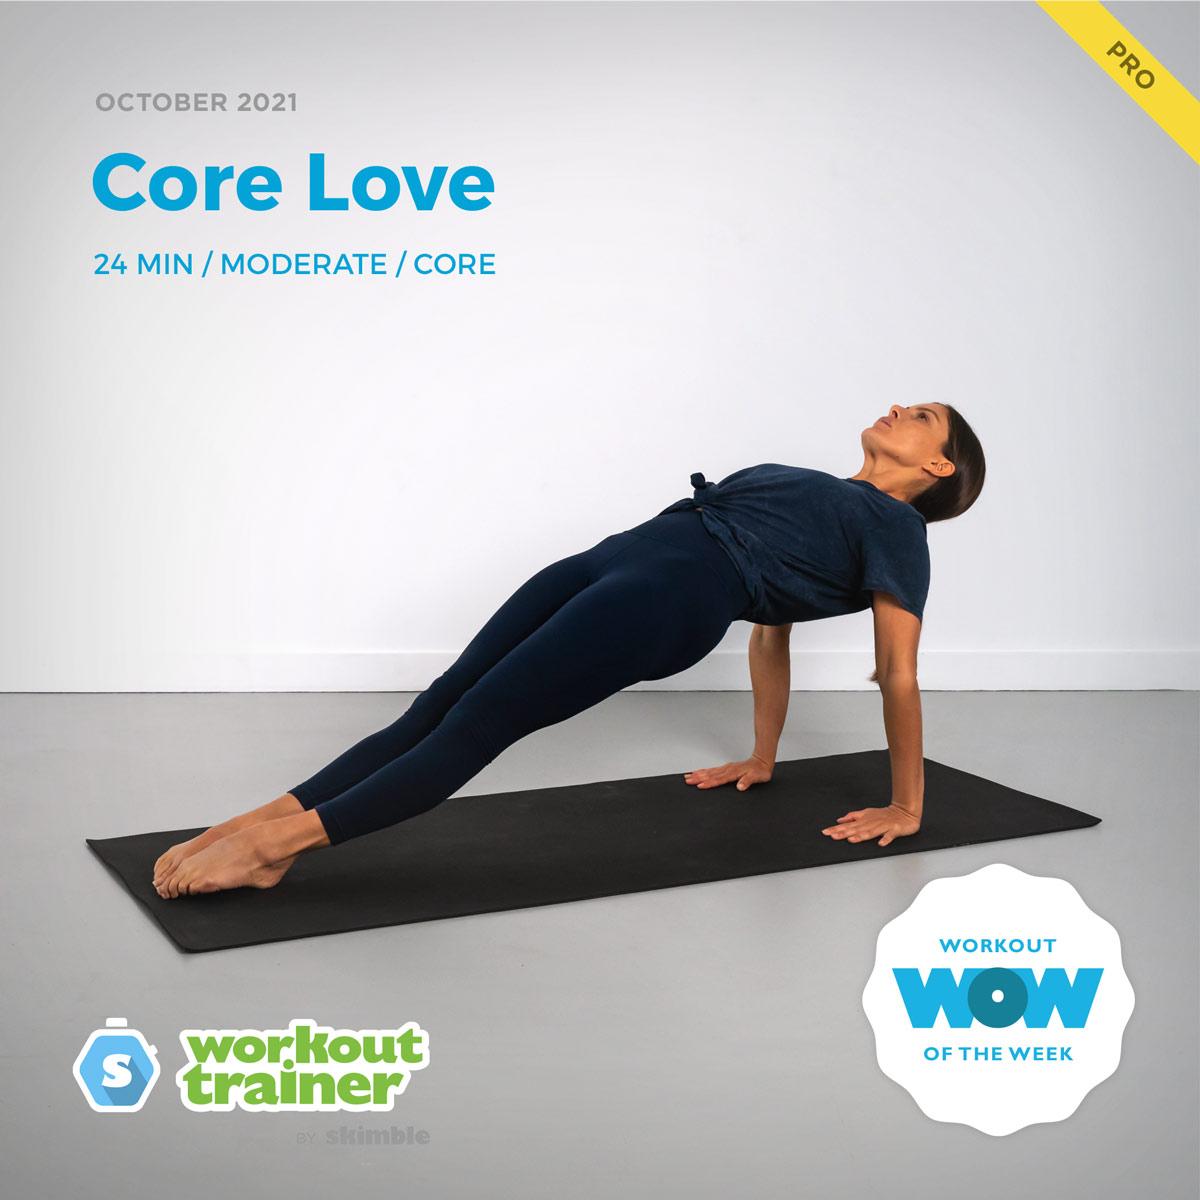 Female Yoga Instructor doing Upward Plank on a black yoga mat